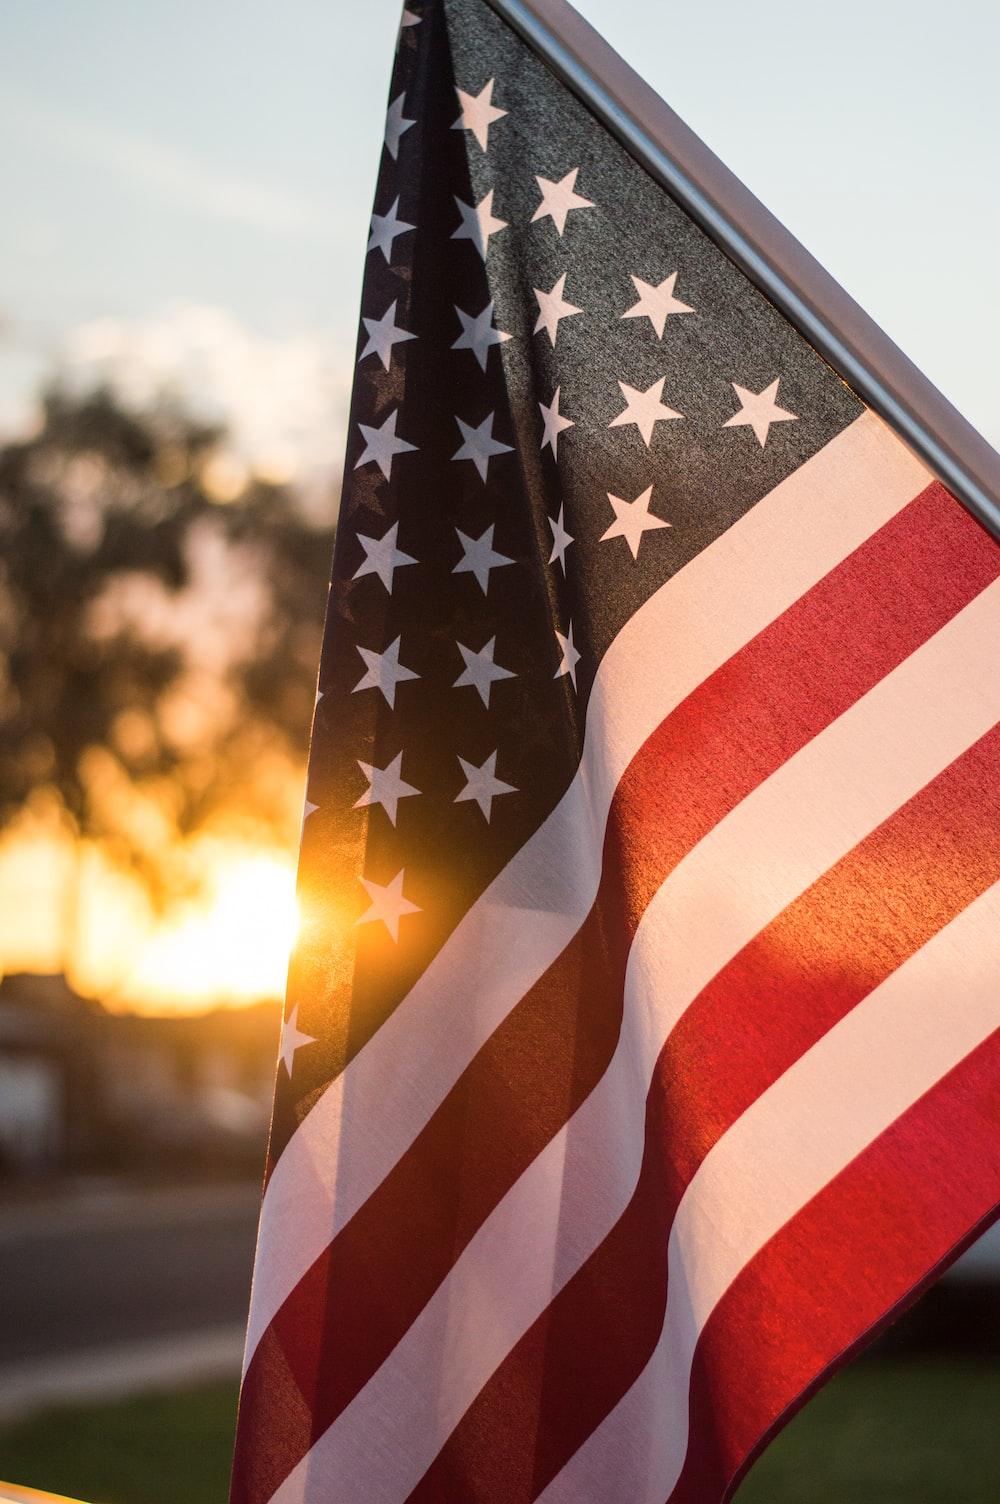 selective focus photo of U.S.A. flag